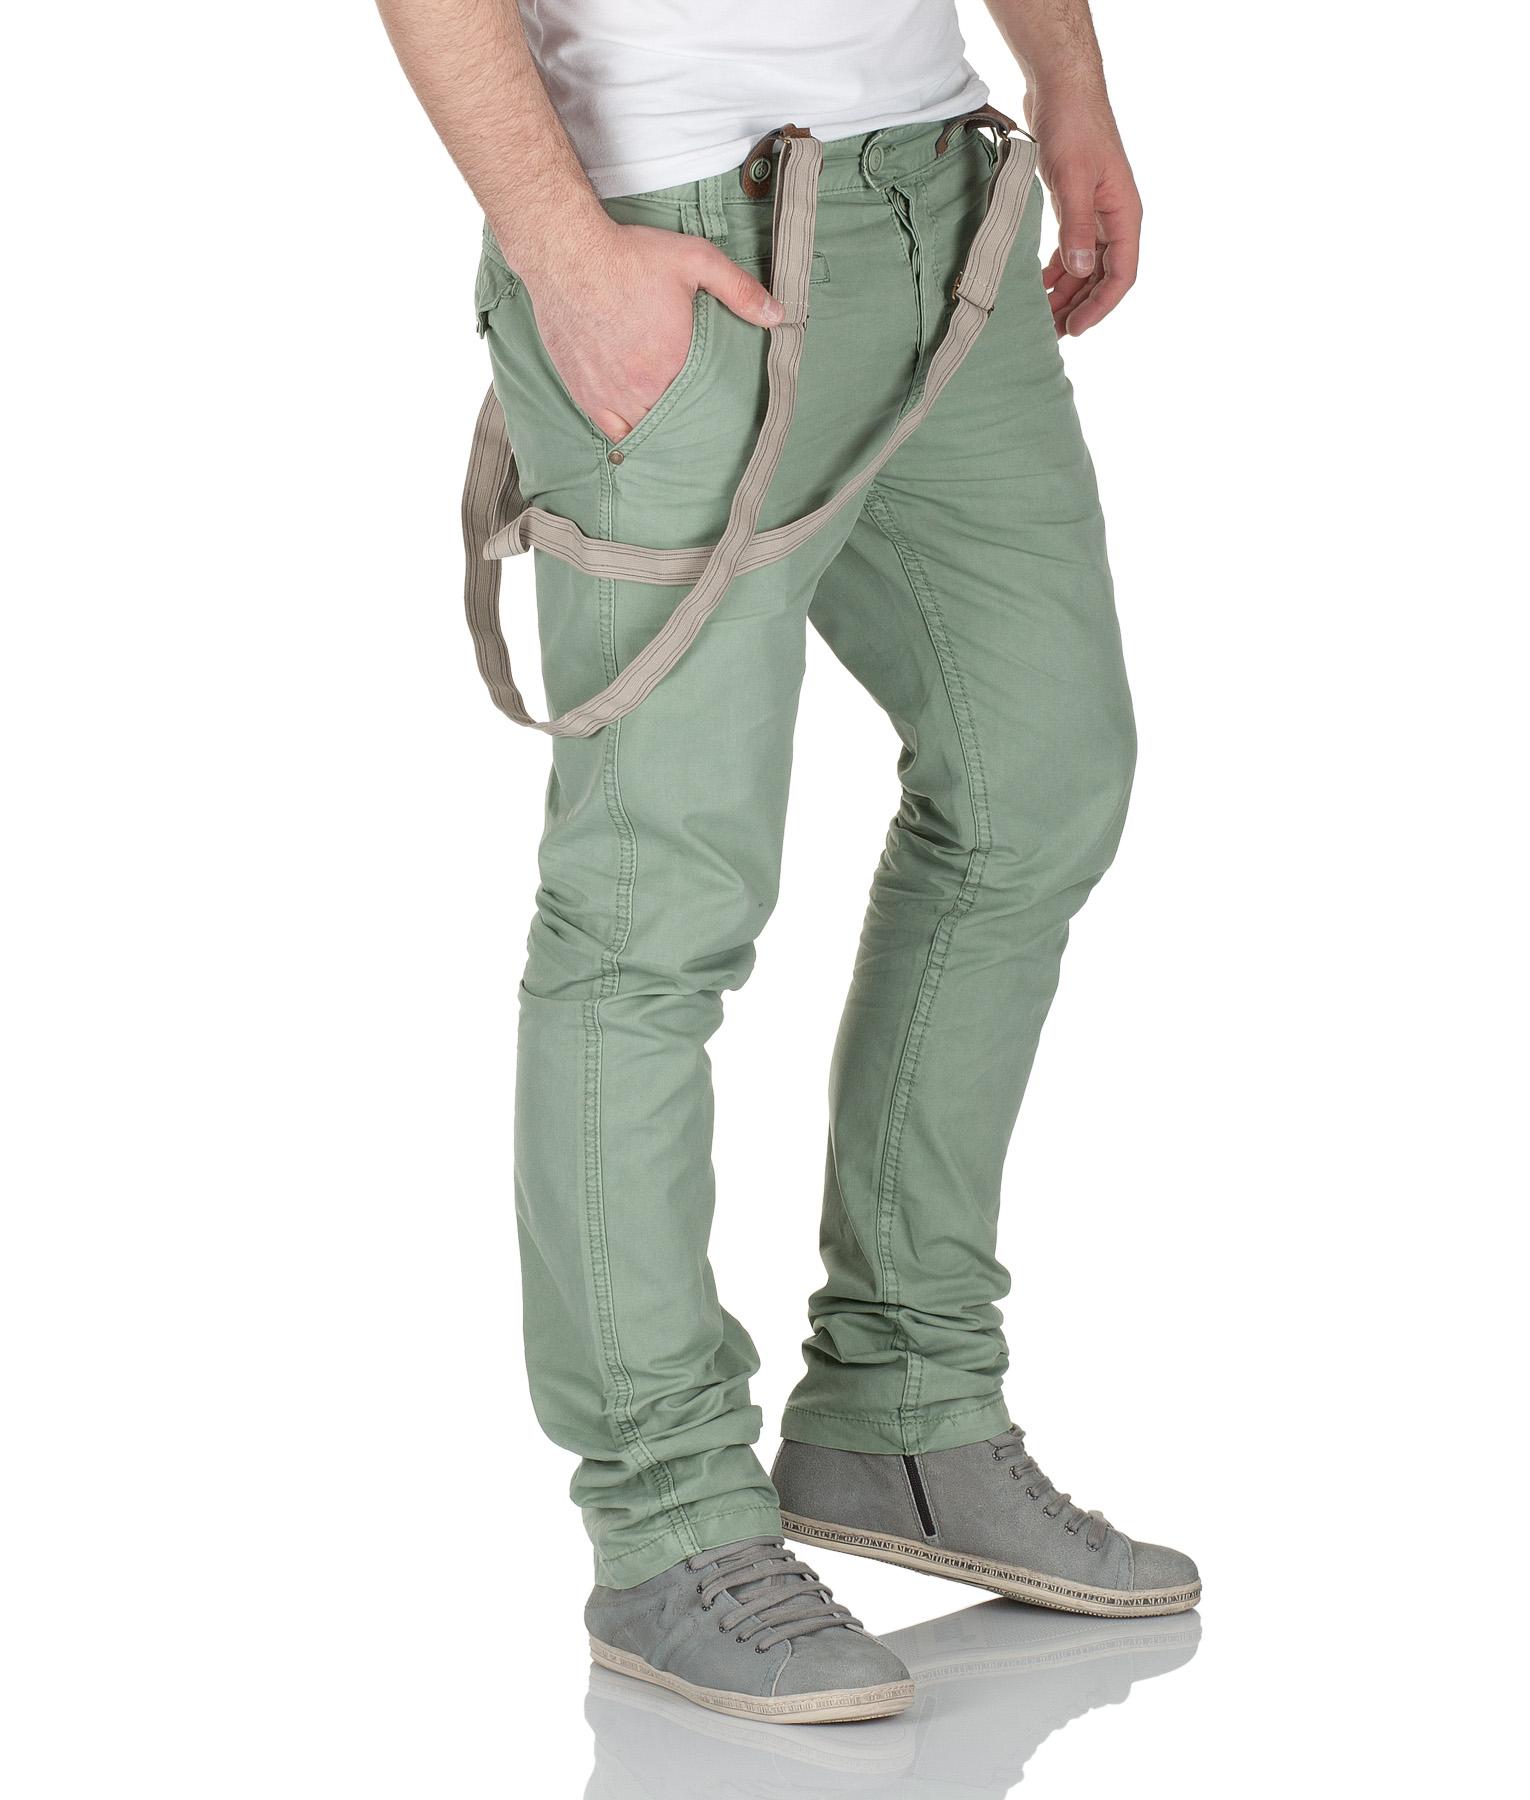 urban surface herren chino hose mit hosentr ger by eight2nine jeans mod 3578 d g ebay. Black Bedroom Furniture Sets. Home Design Ideas